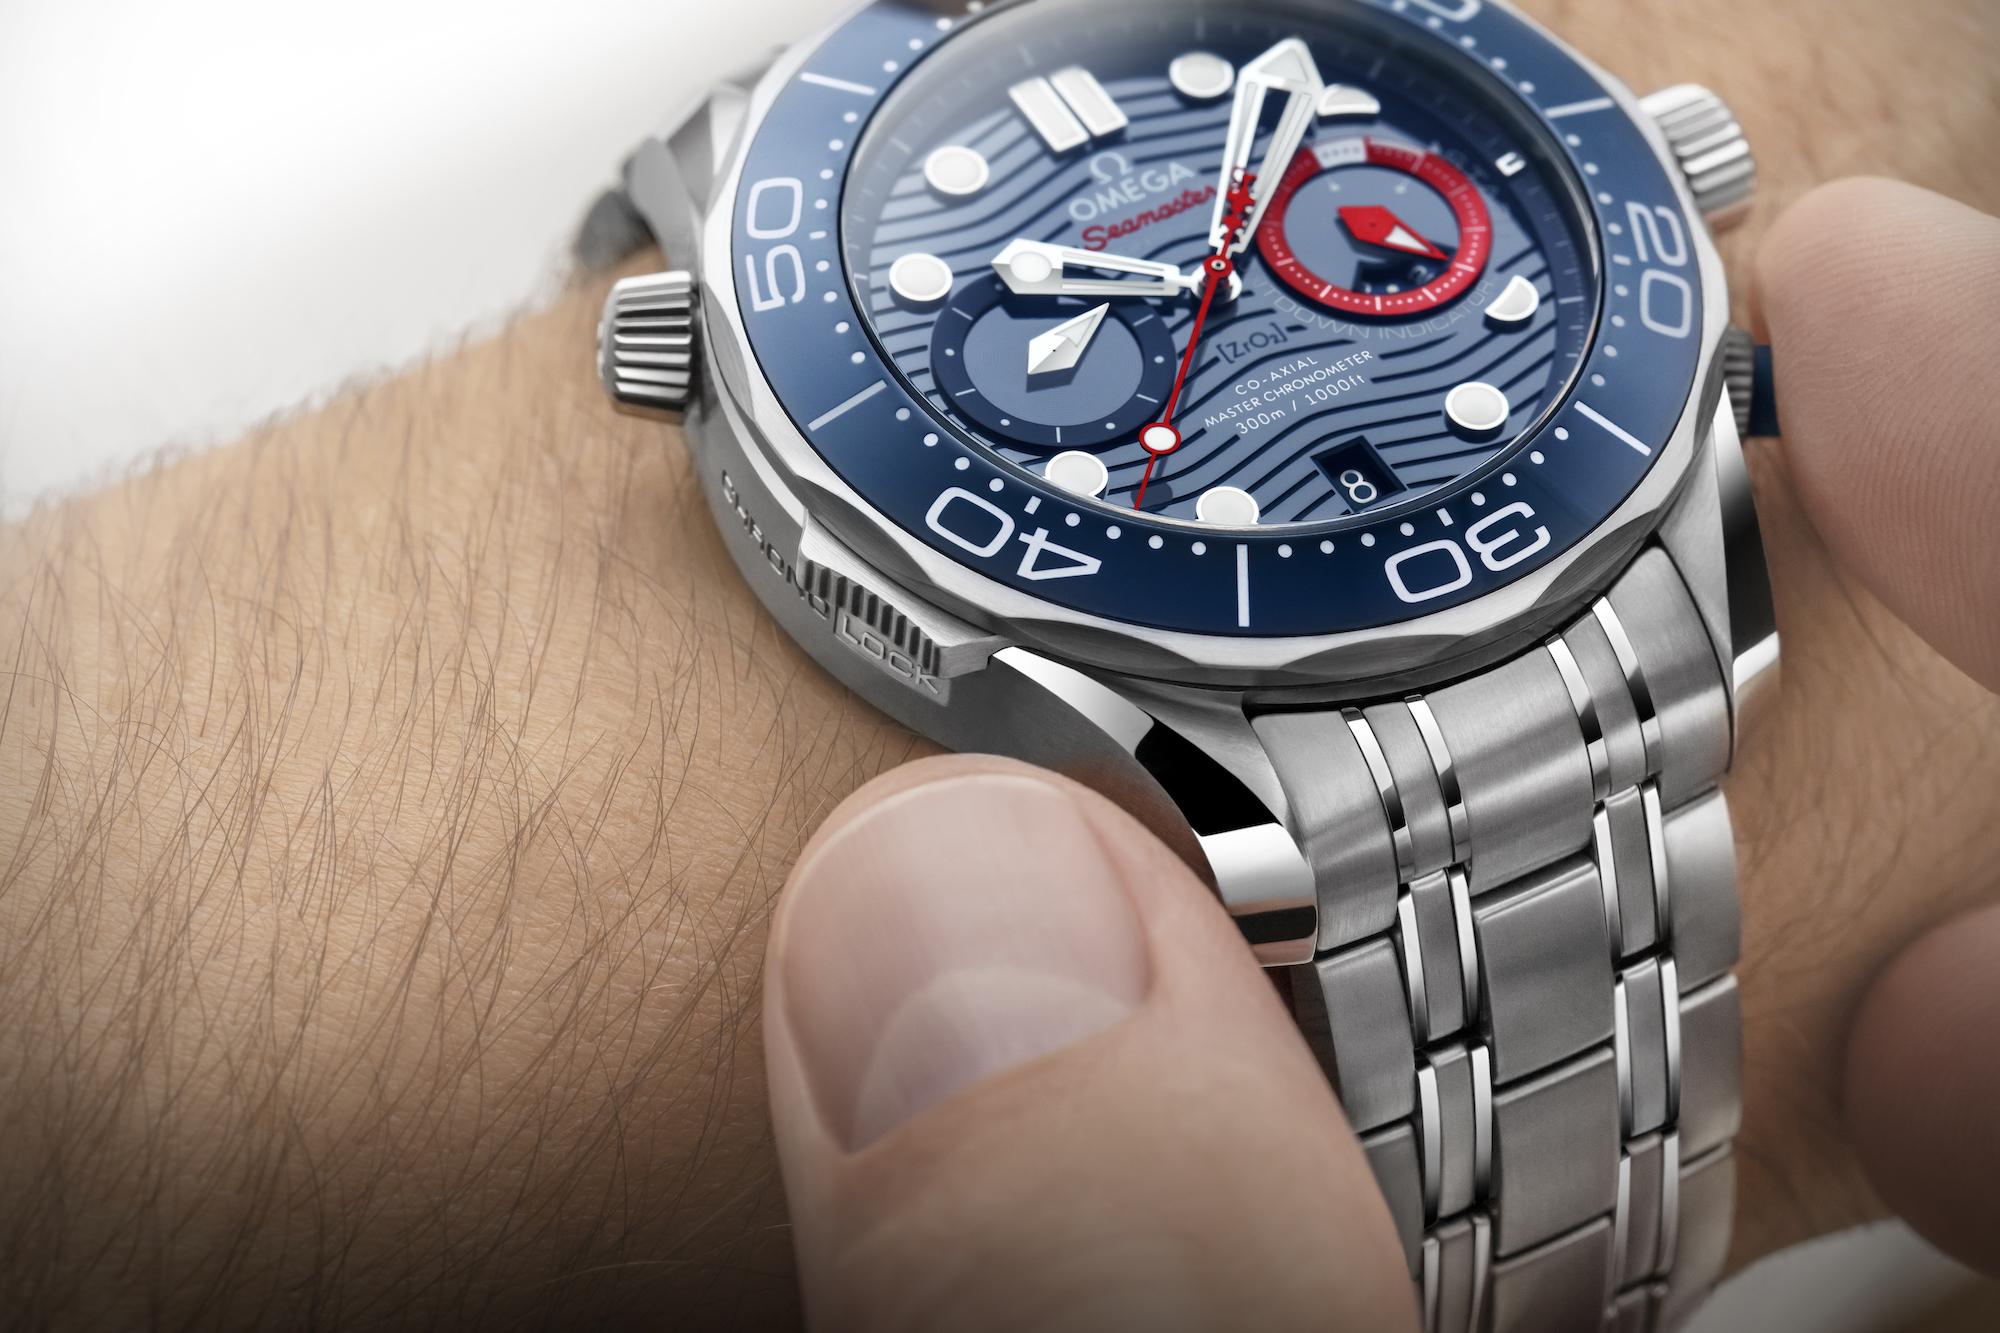 Omega Seamaster Diver 300M Americas Cup Chronograph 210.30.44.51.03.002 bloqueo cronógrafo